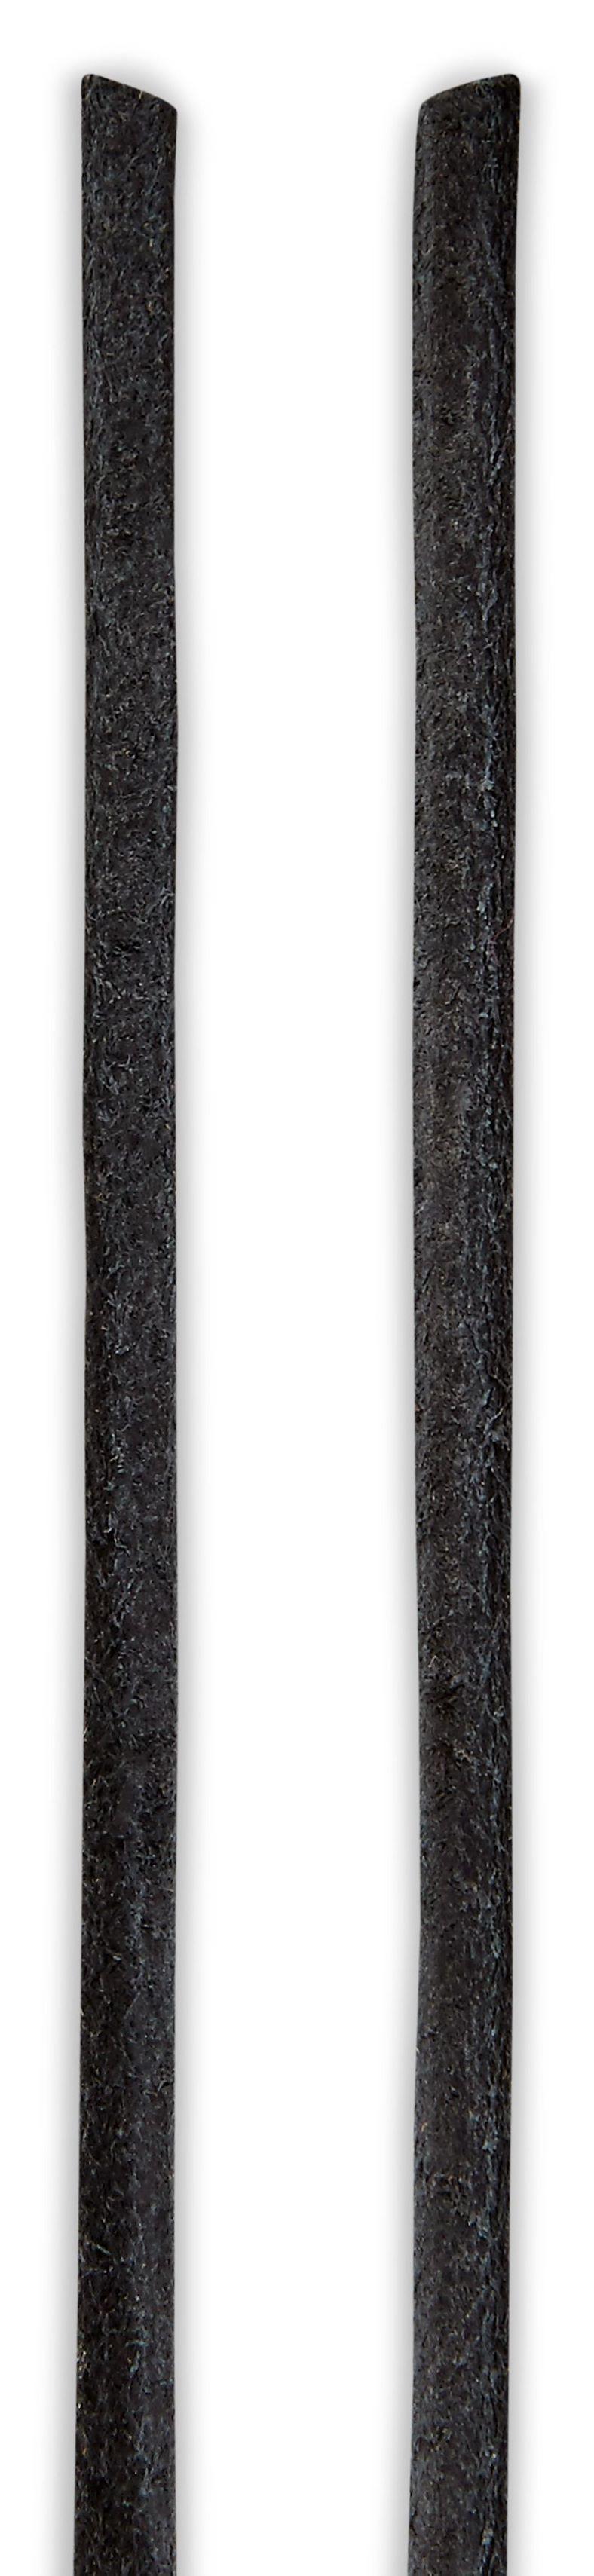 Leather Lace round (أسود)